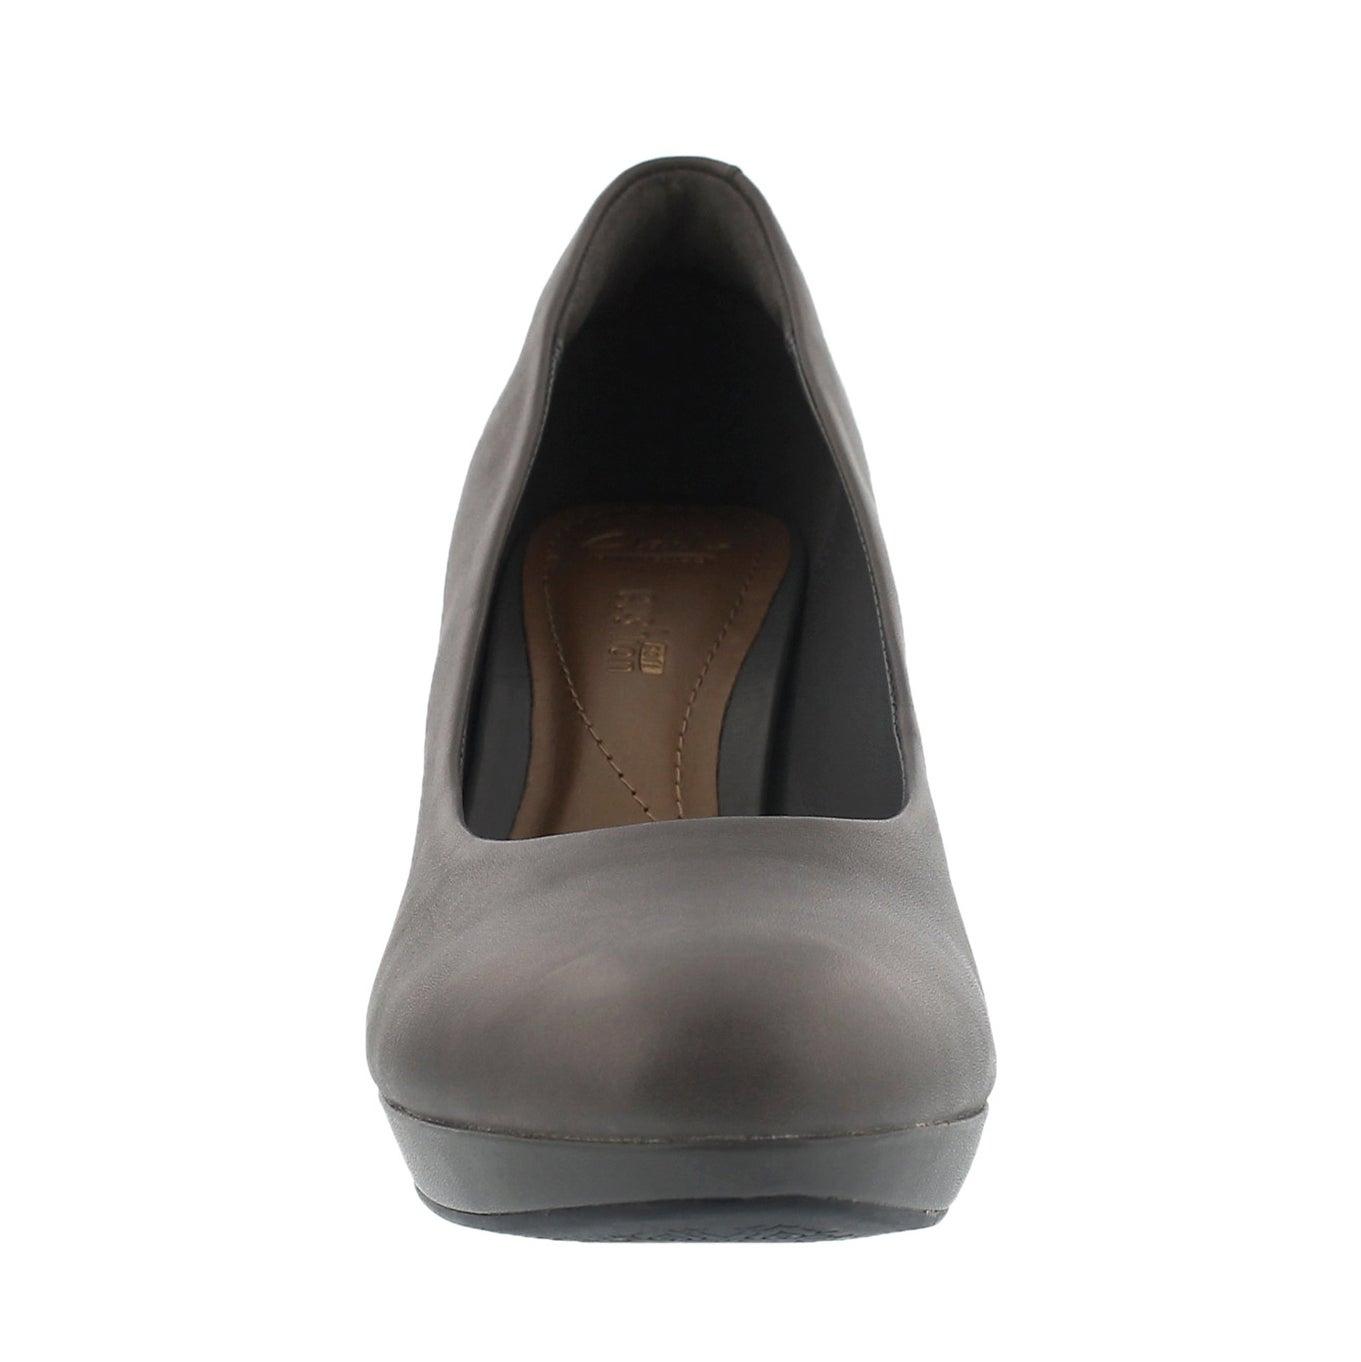 Lds Brier Dolly grey dress heel